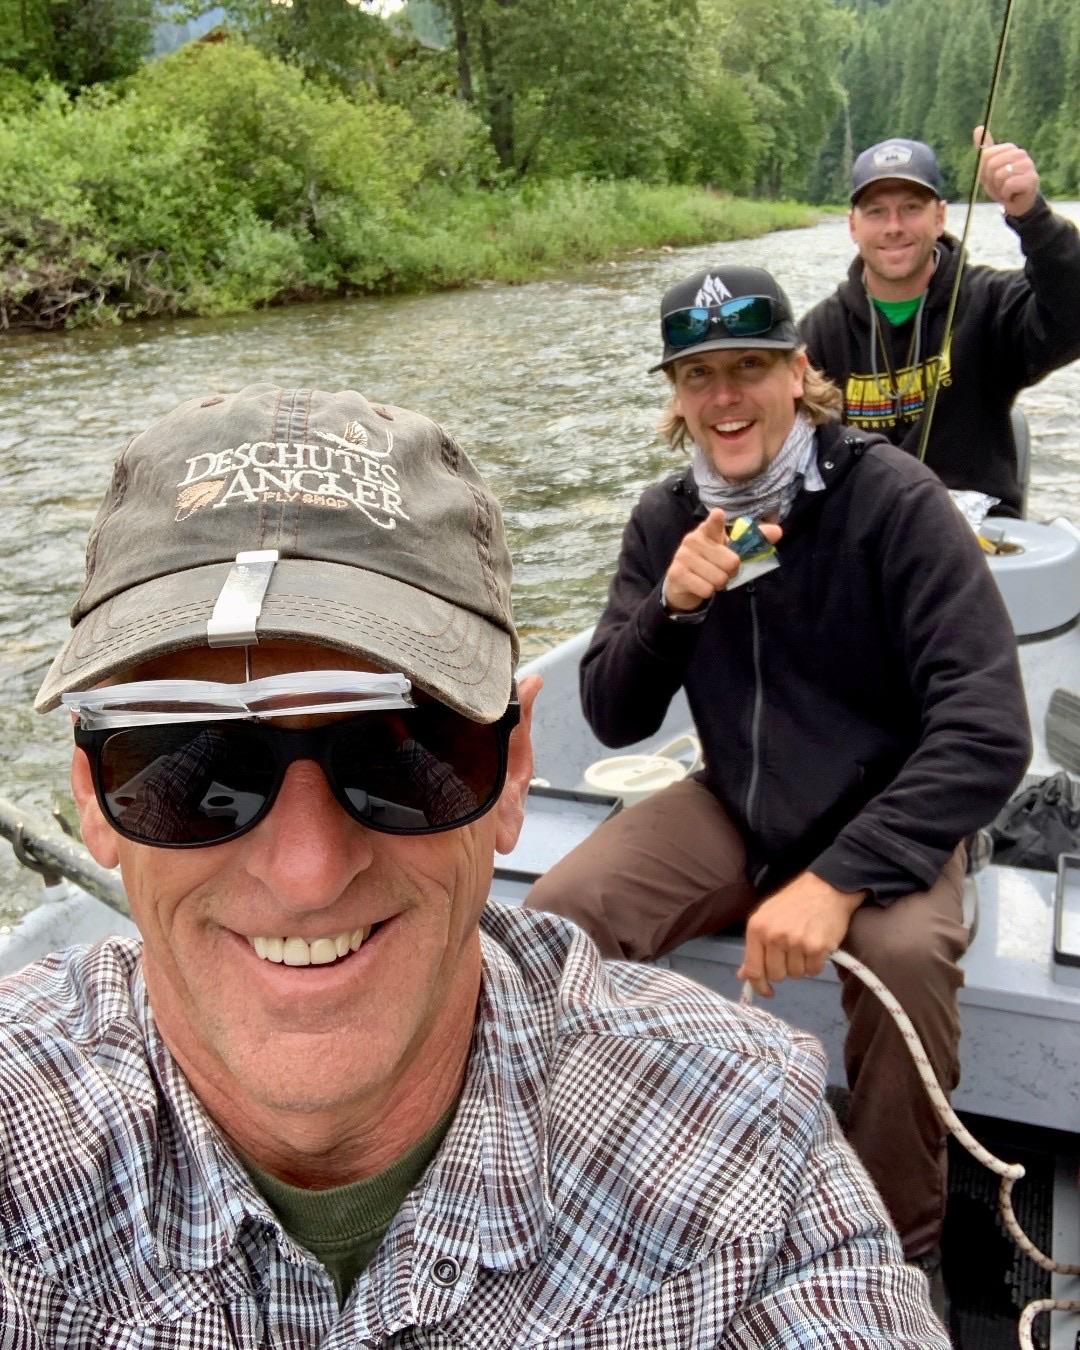 Men river fishing on a boat